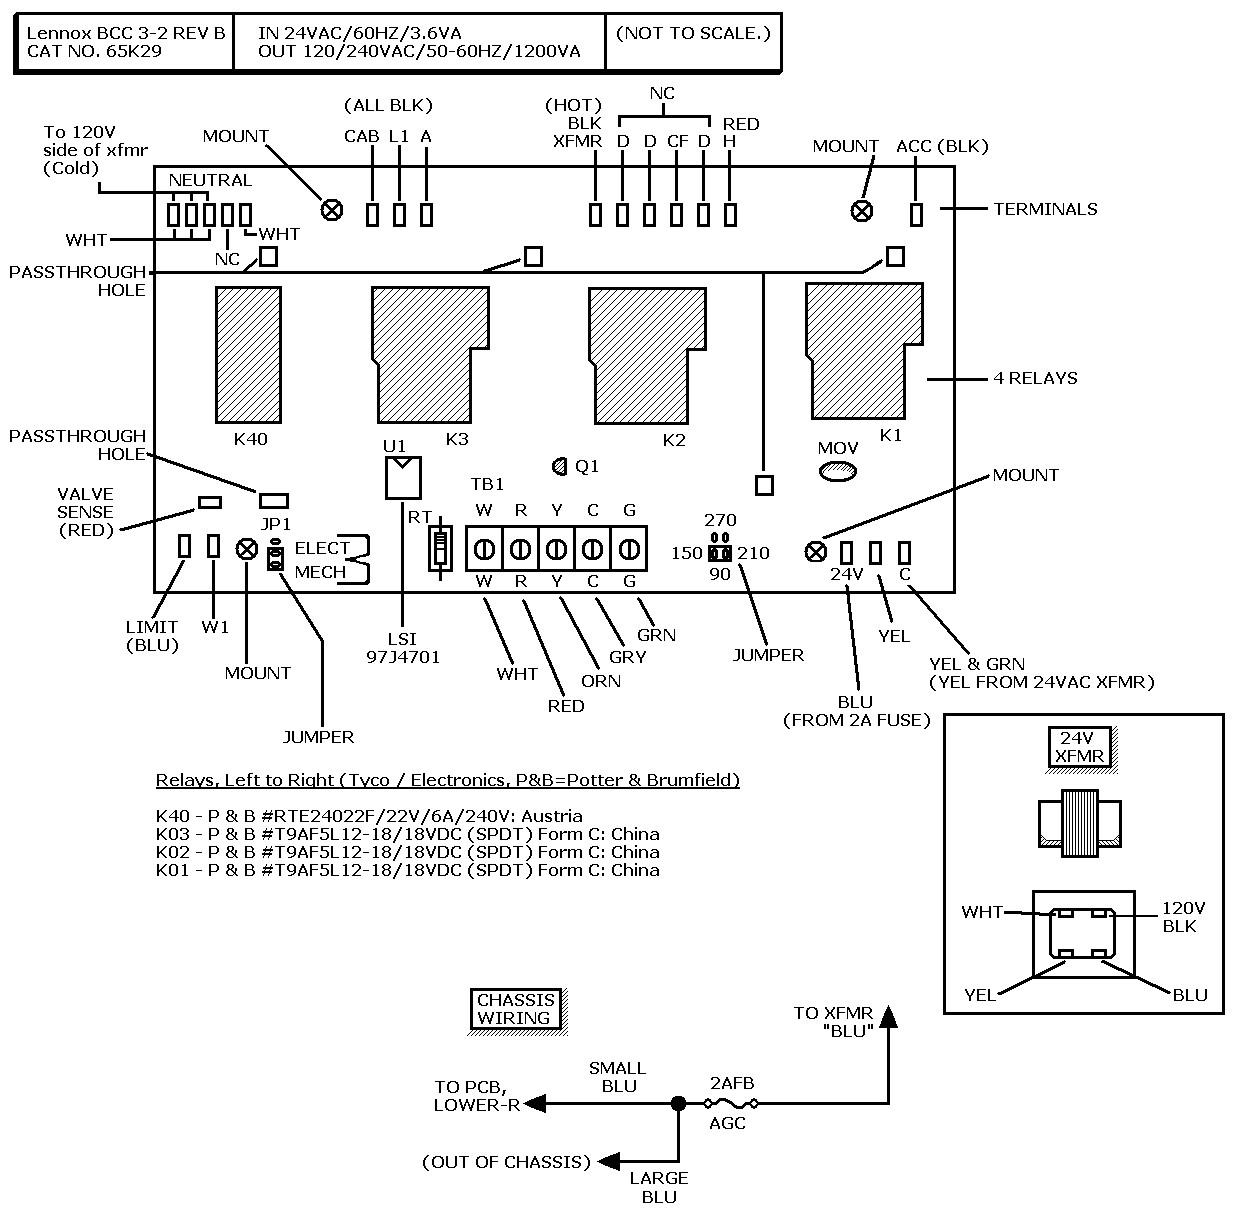 Furnace Control Board Wiring Diagram Controller Furnace2 In